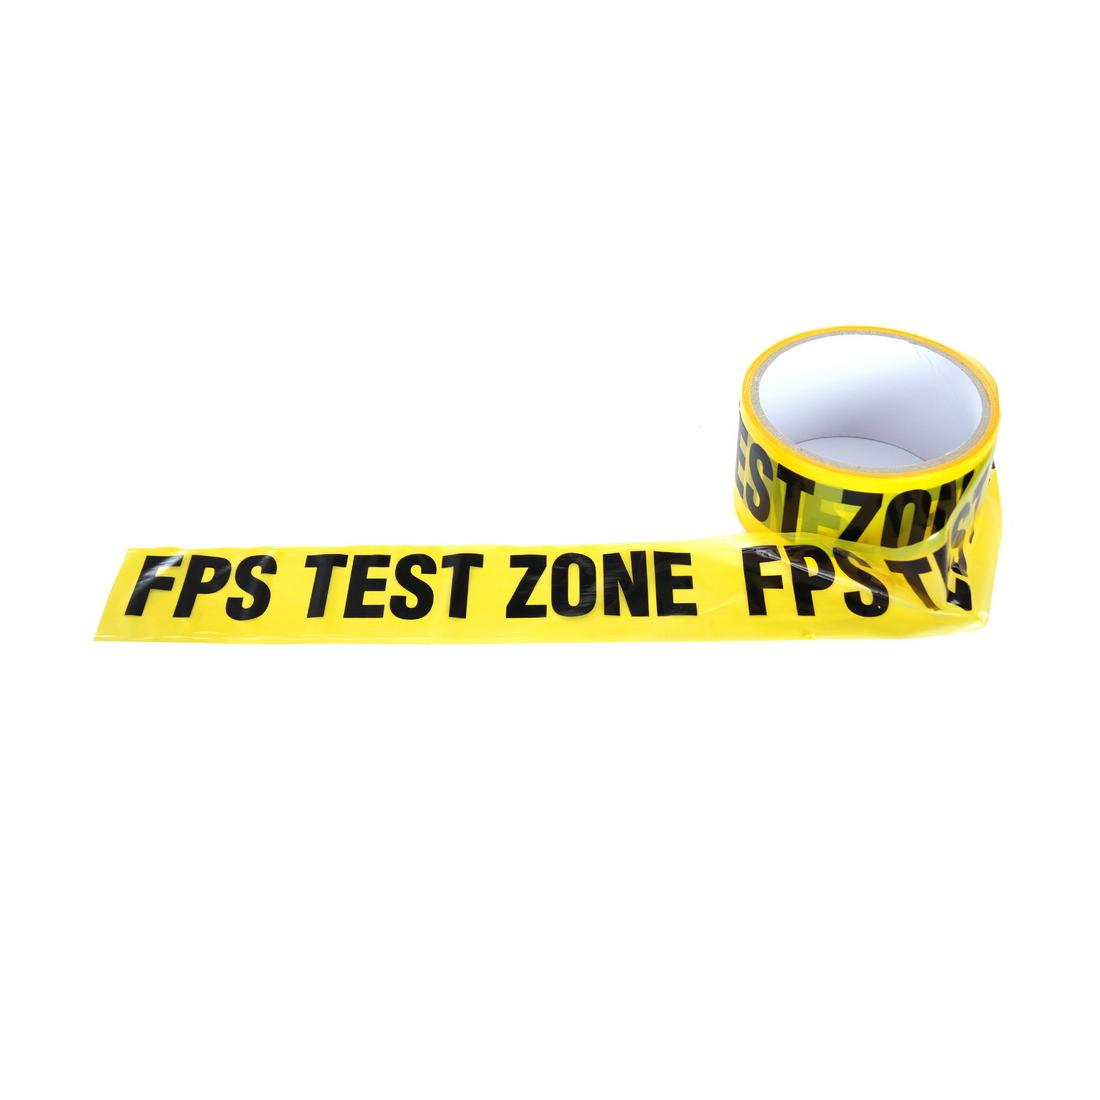 Zone tape FPS - test zone